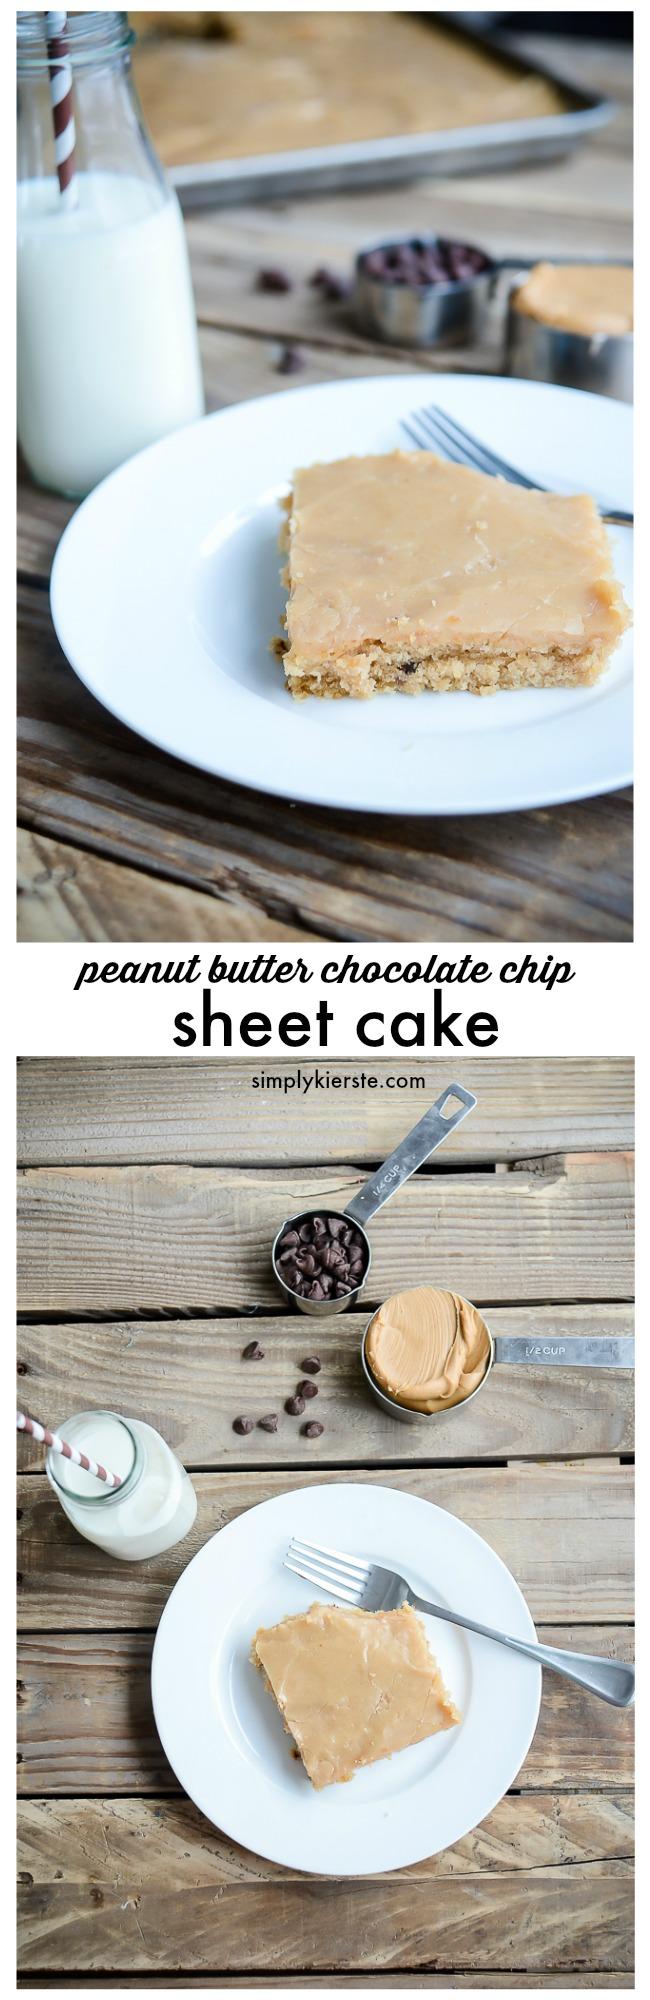 Peanut Butter Chocolate Chip Sheet Cake   oldsaltfarm.com